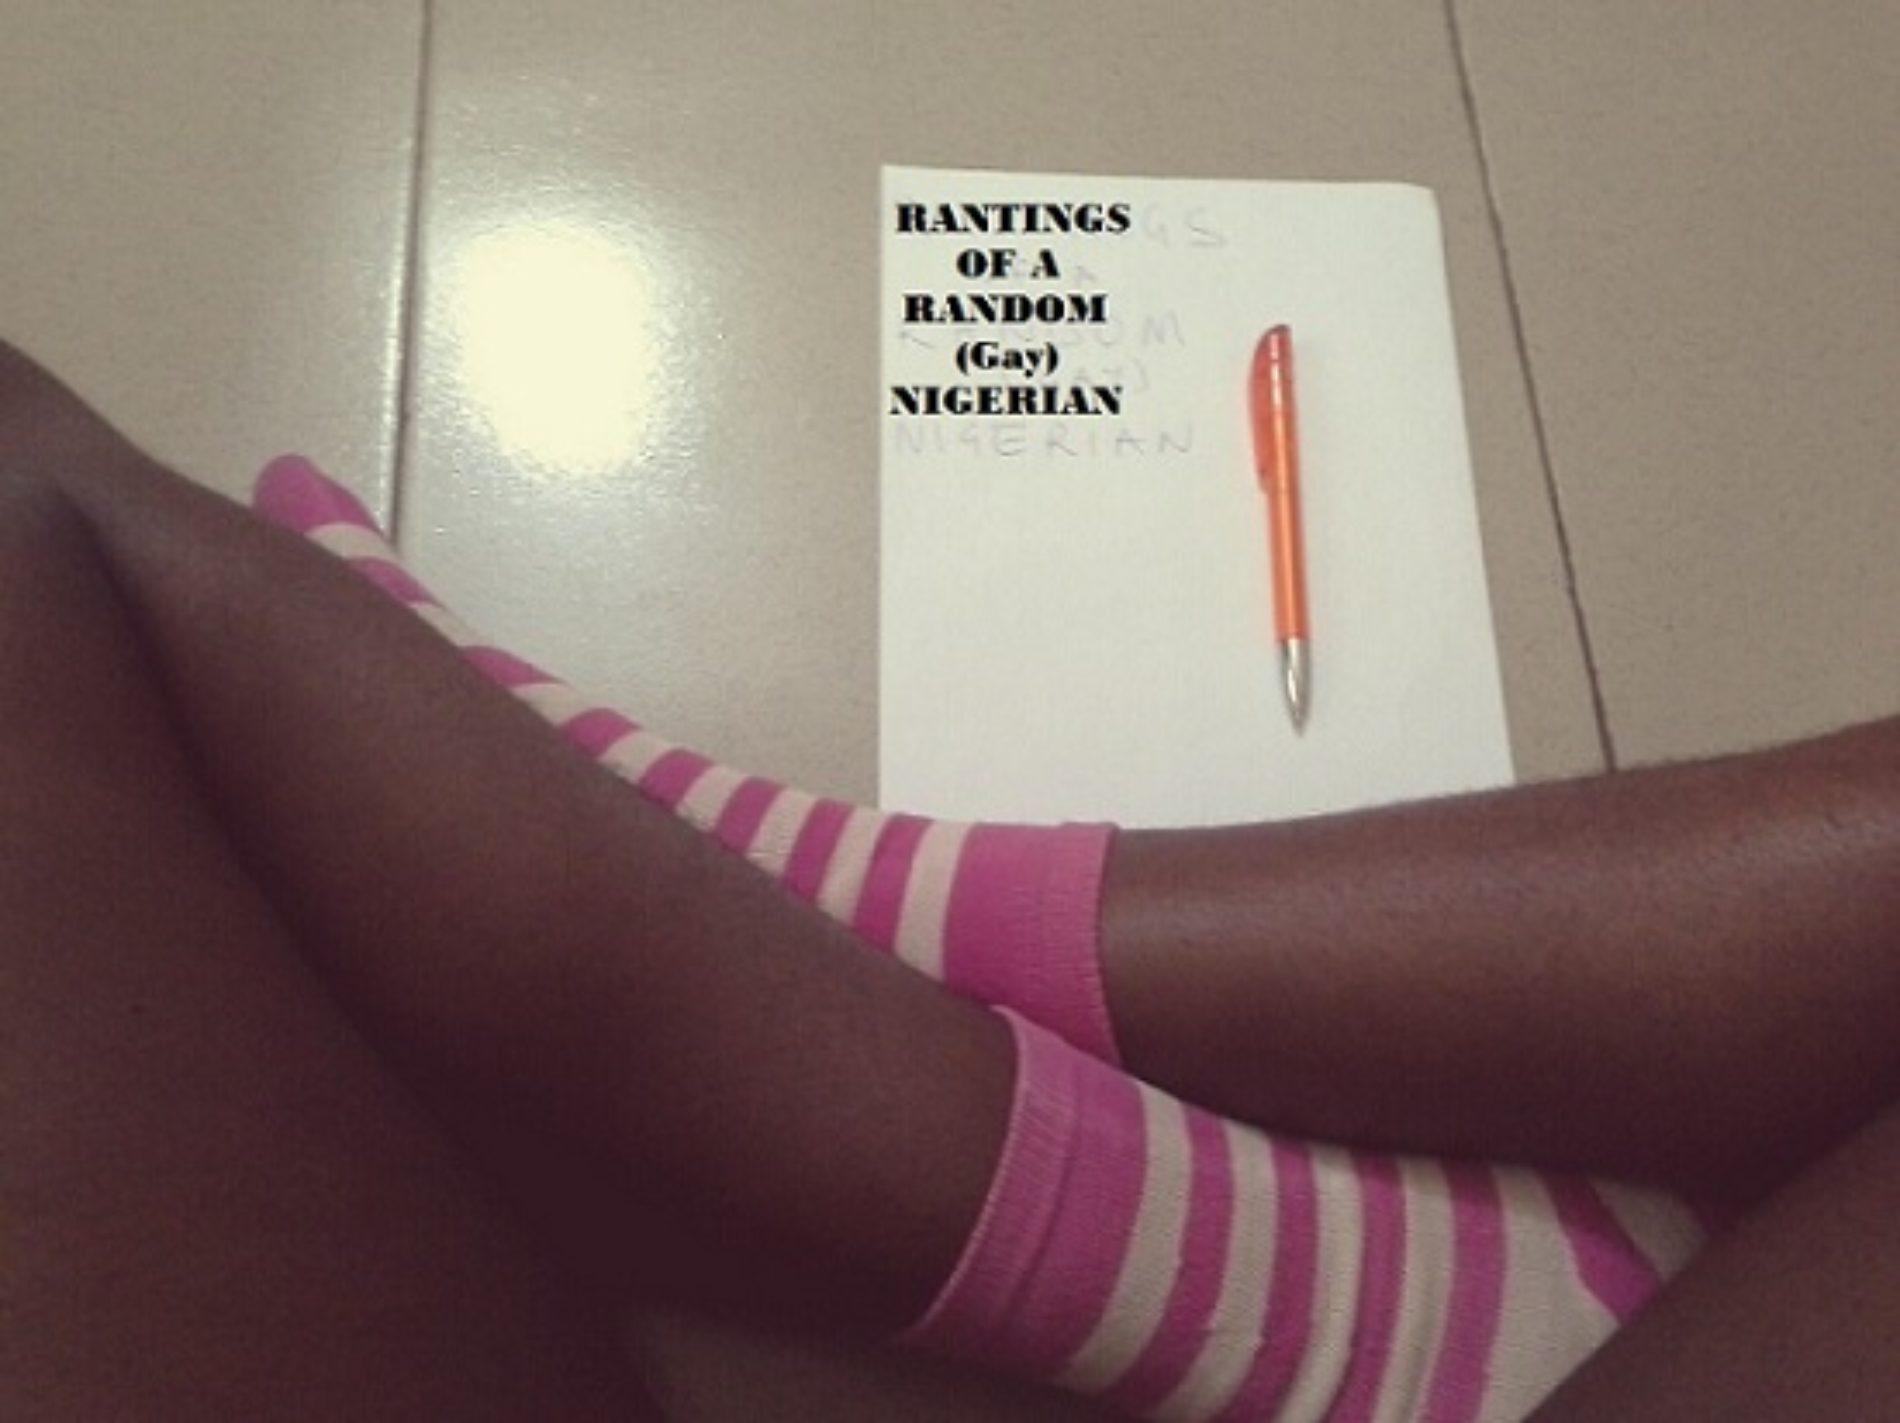 RANTINGS OF A RANDOM (Gay) NIGERIAN (Entry 40)